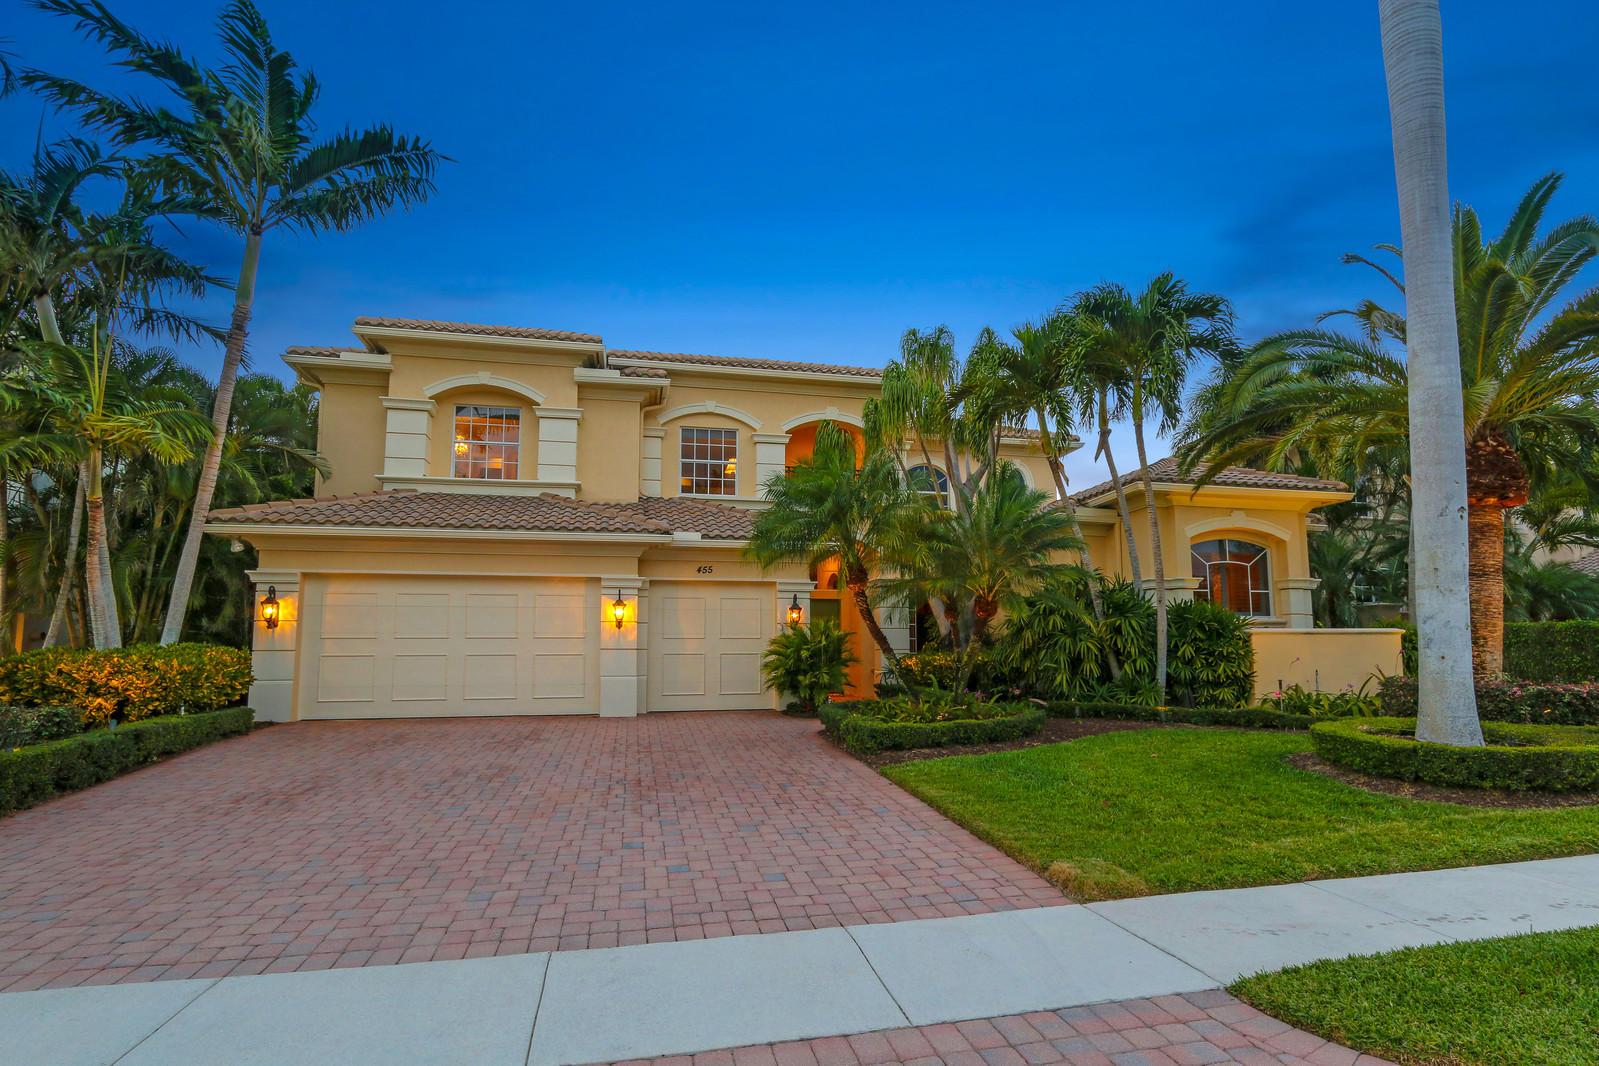 455 Savoie Drive, Palm Beach Gardens, Florida 33410, 5 Bedrooms Bedrooms, ,5.1 BathroomsBathrooms,A,Single family,Savoie,RX-10420557